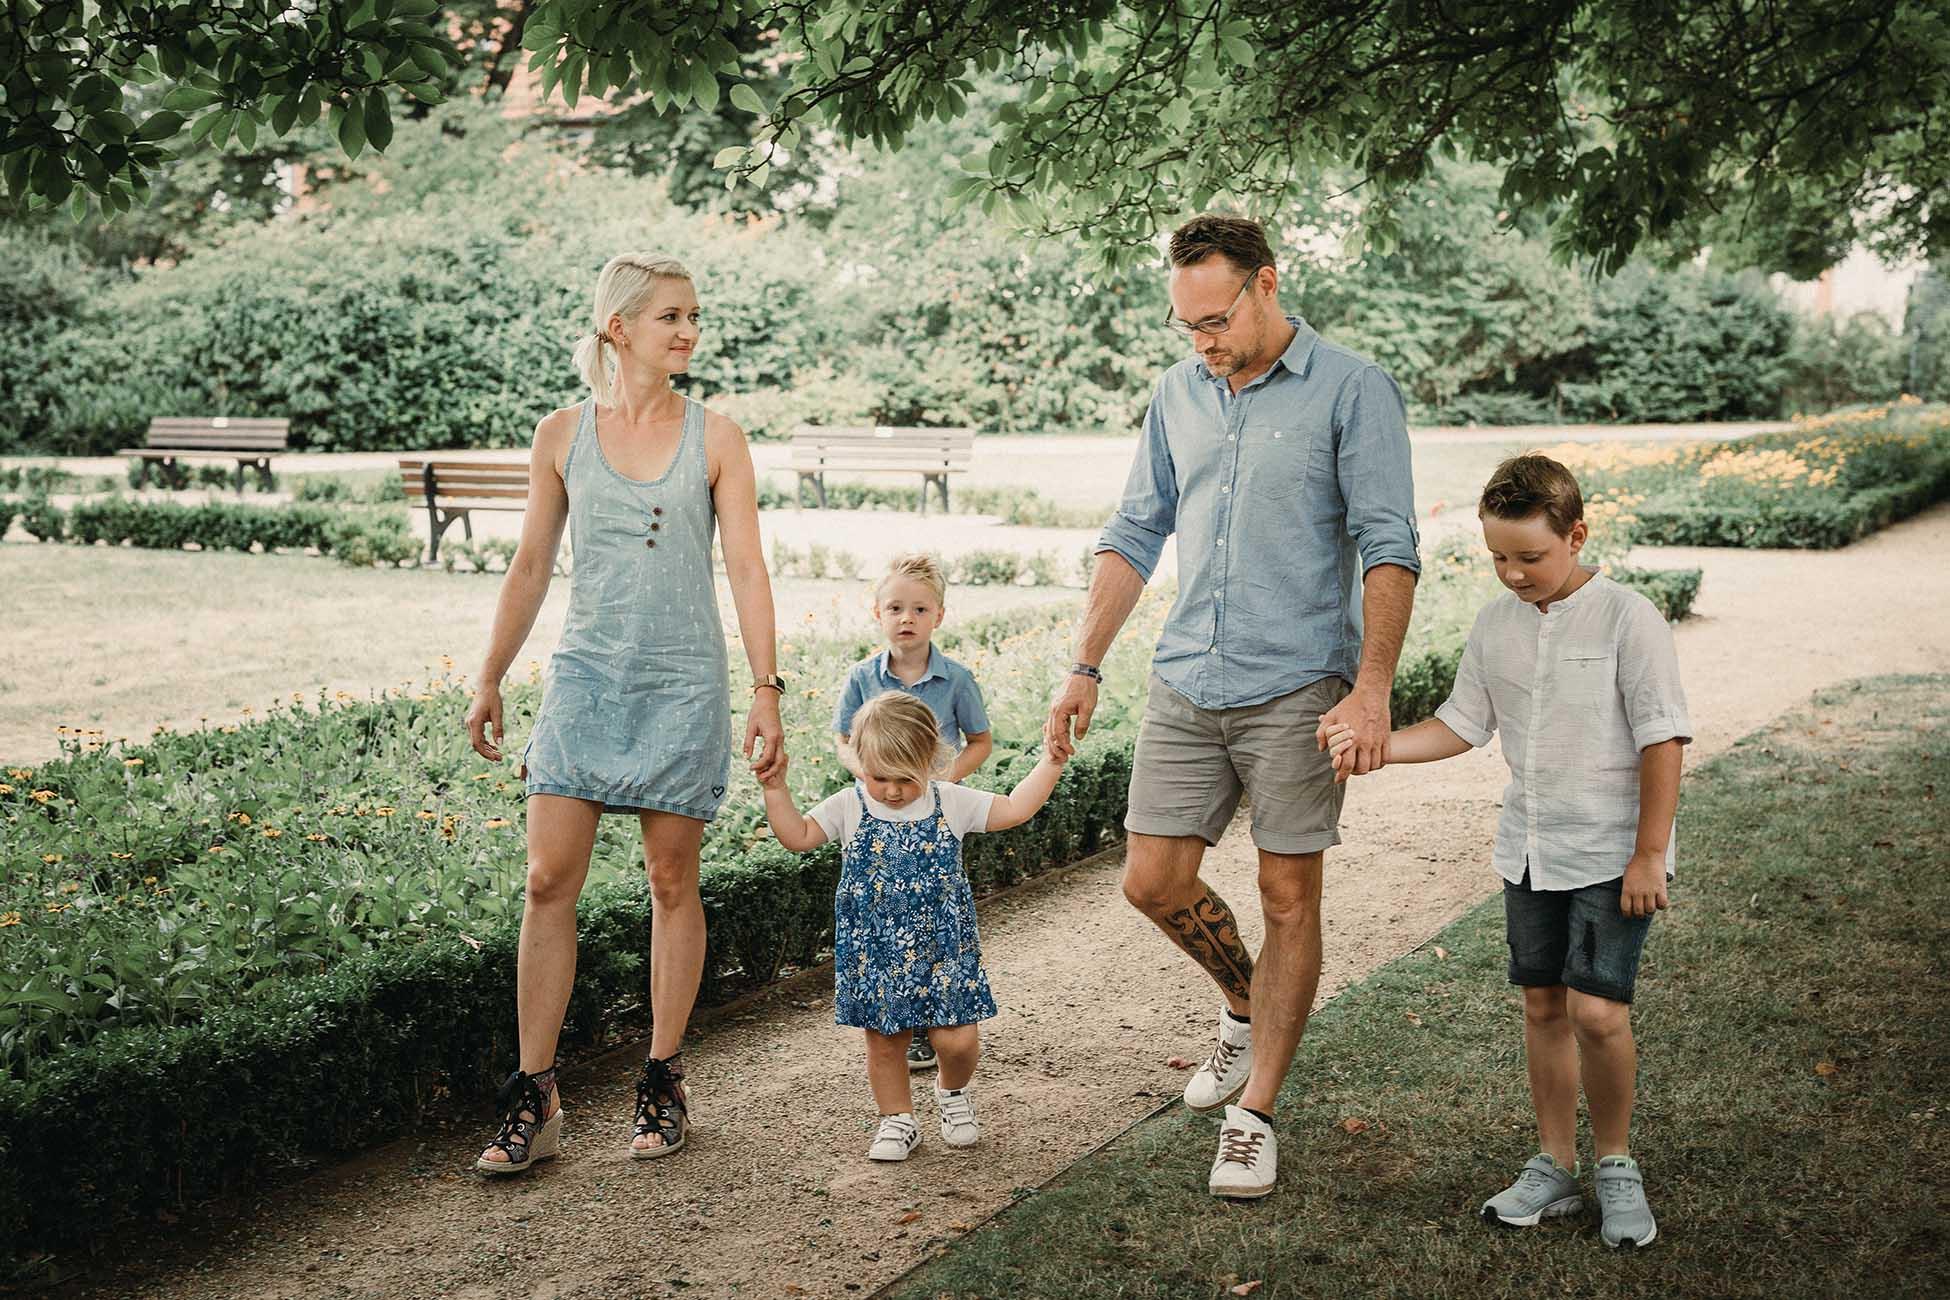 Familienshooting-8239